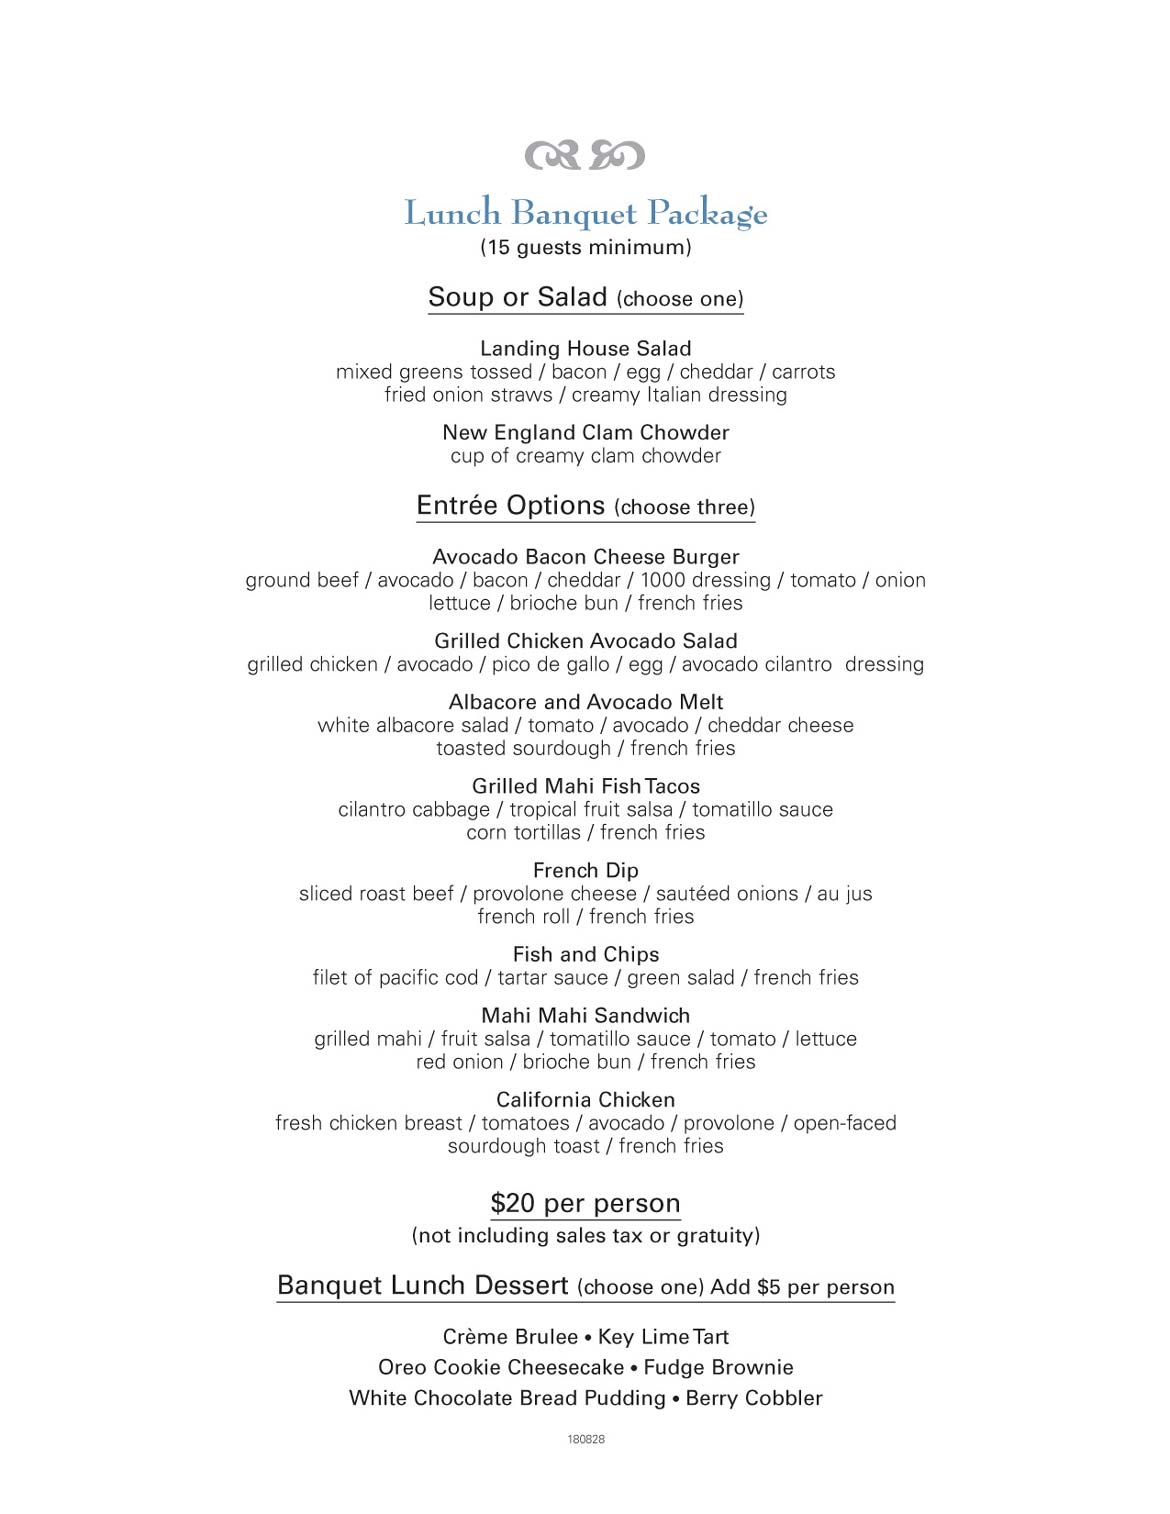 Lunch - Newport Landing